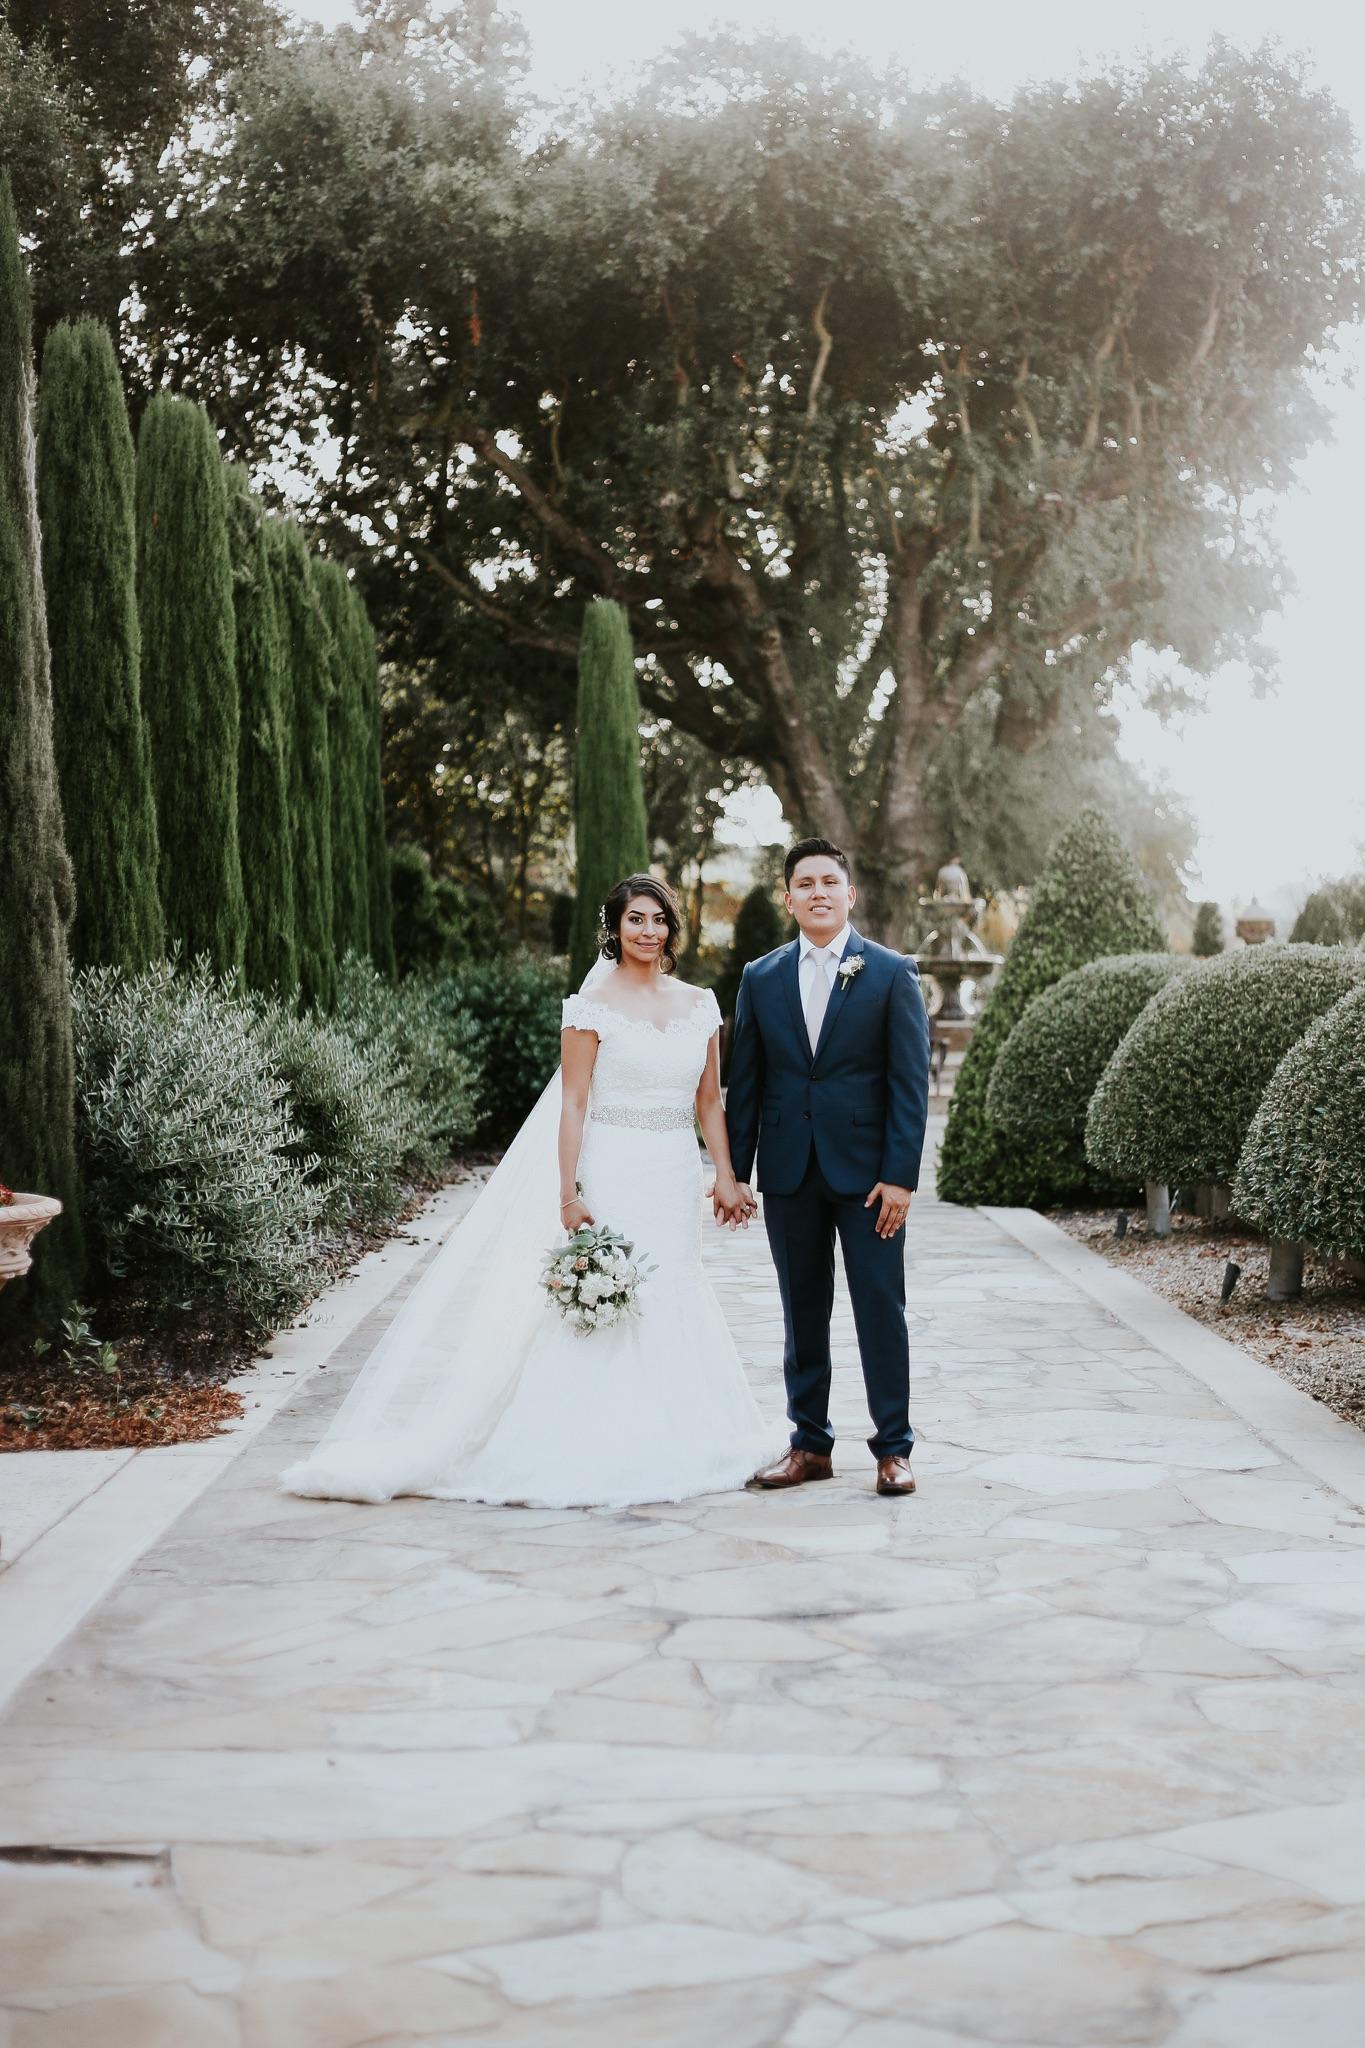 Magical wedding in stockton ca weddingmix blog for Wedding venues stockton ca